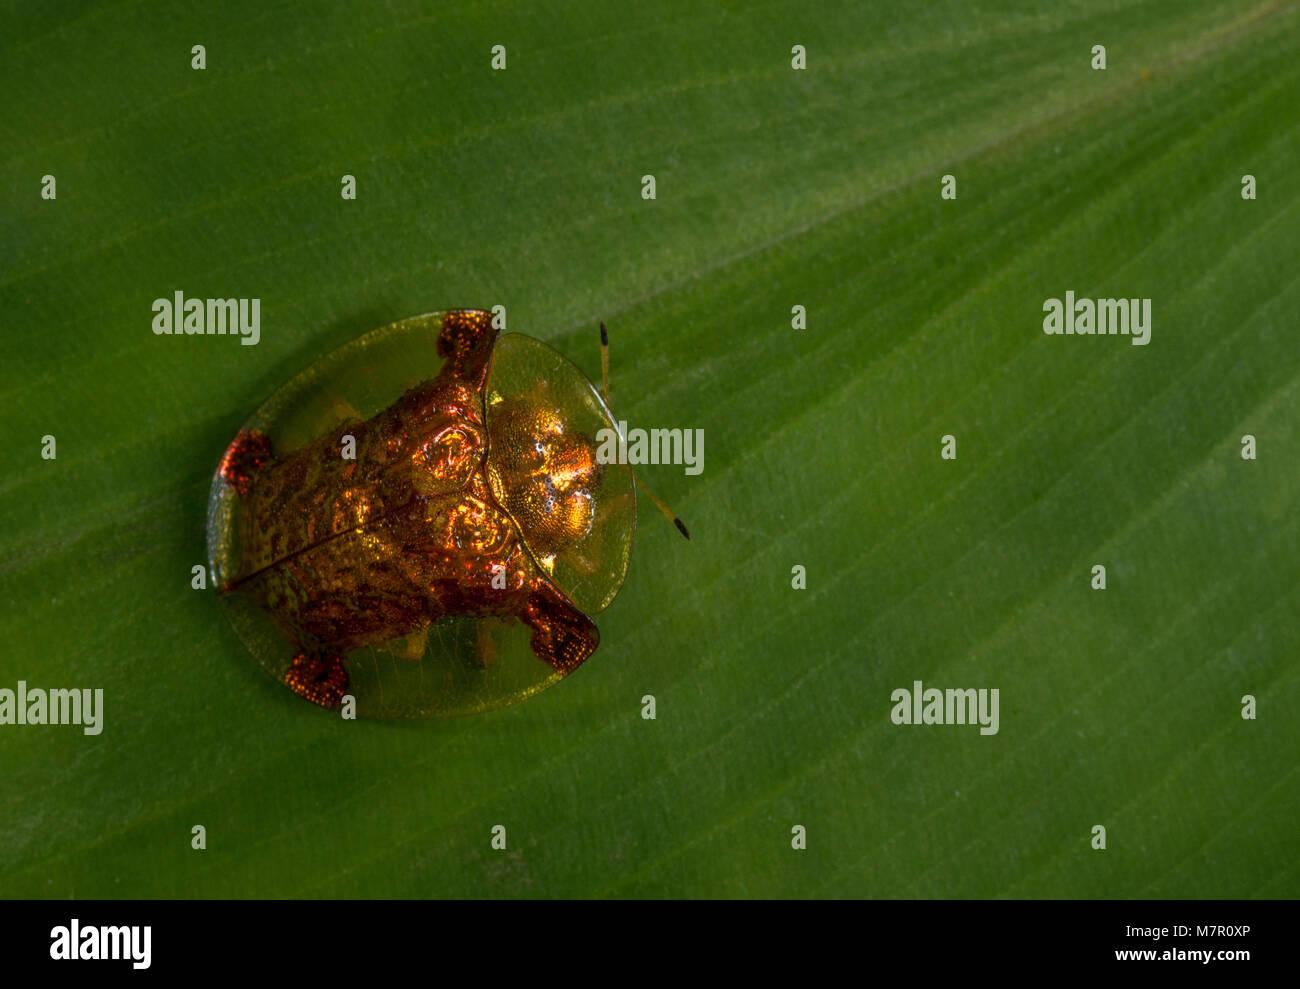 Tortoise Beetle seeen at Pawna lake Stock Photo